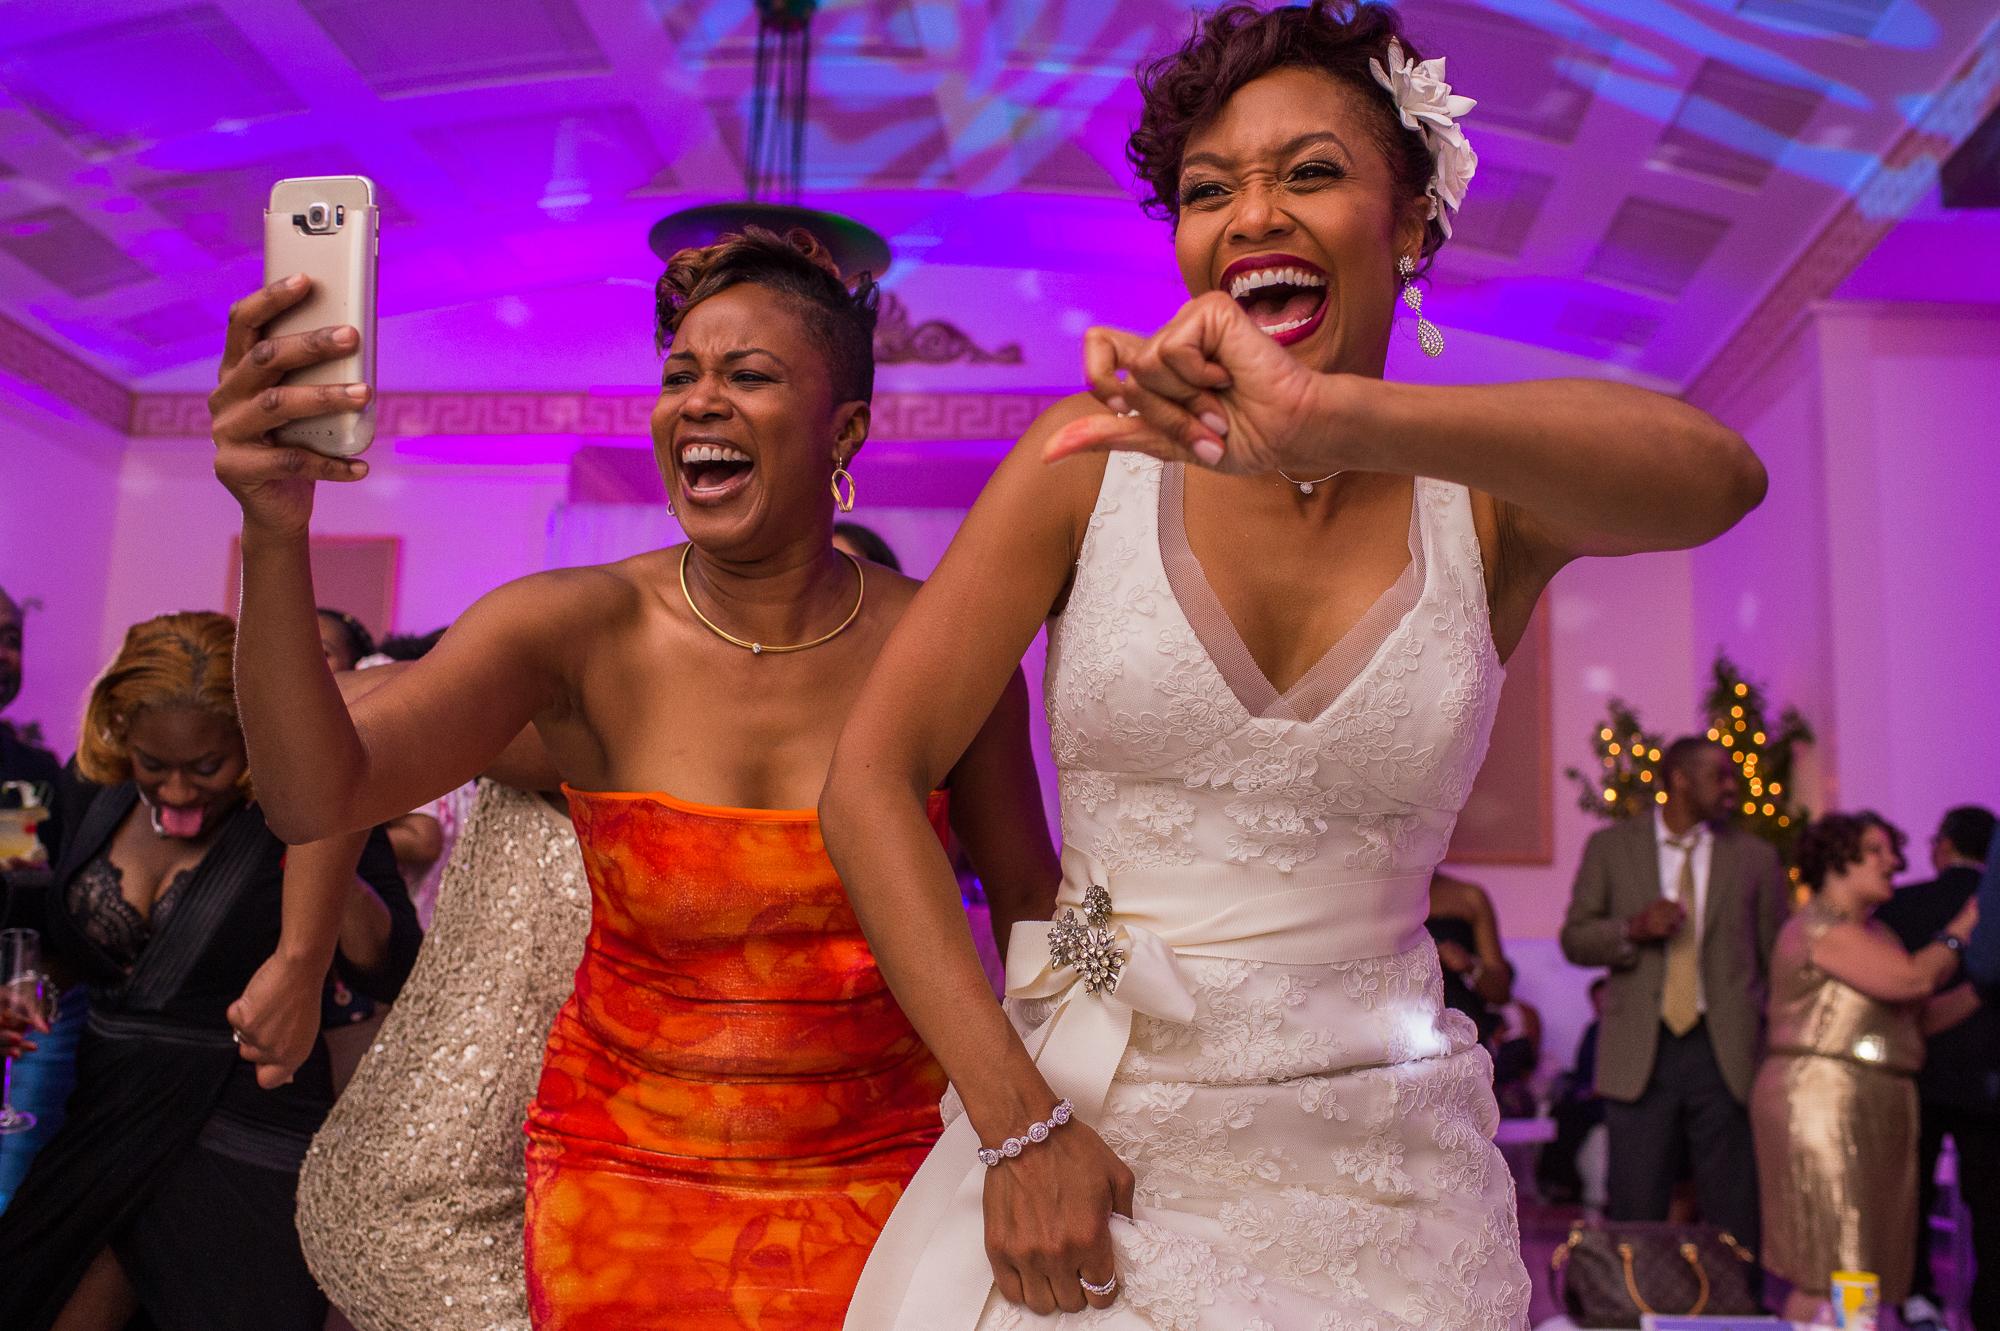 happy-bride-dancing-with-bridesmaid-taking-a-selfie-christopher-jason-studios